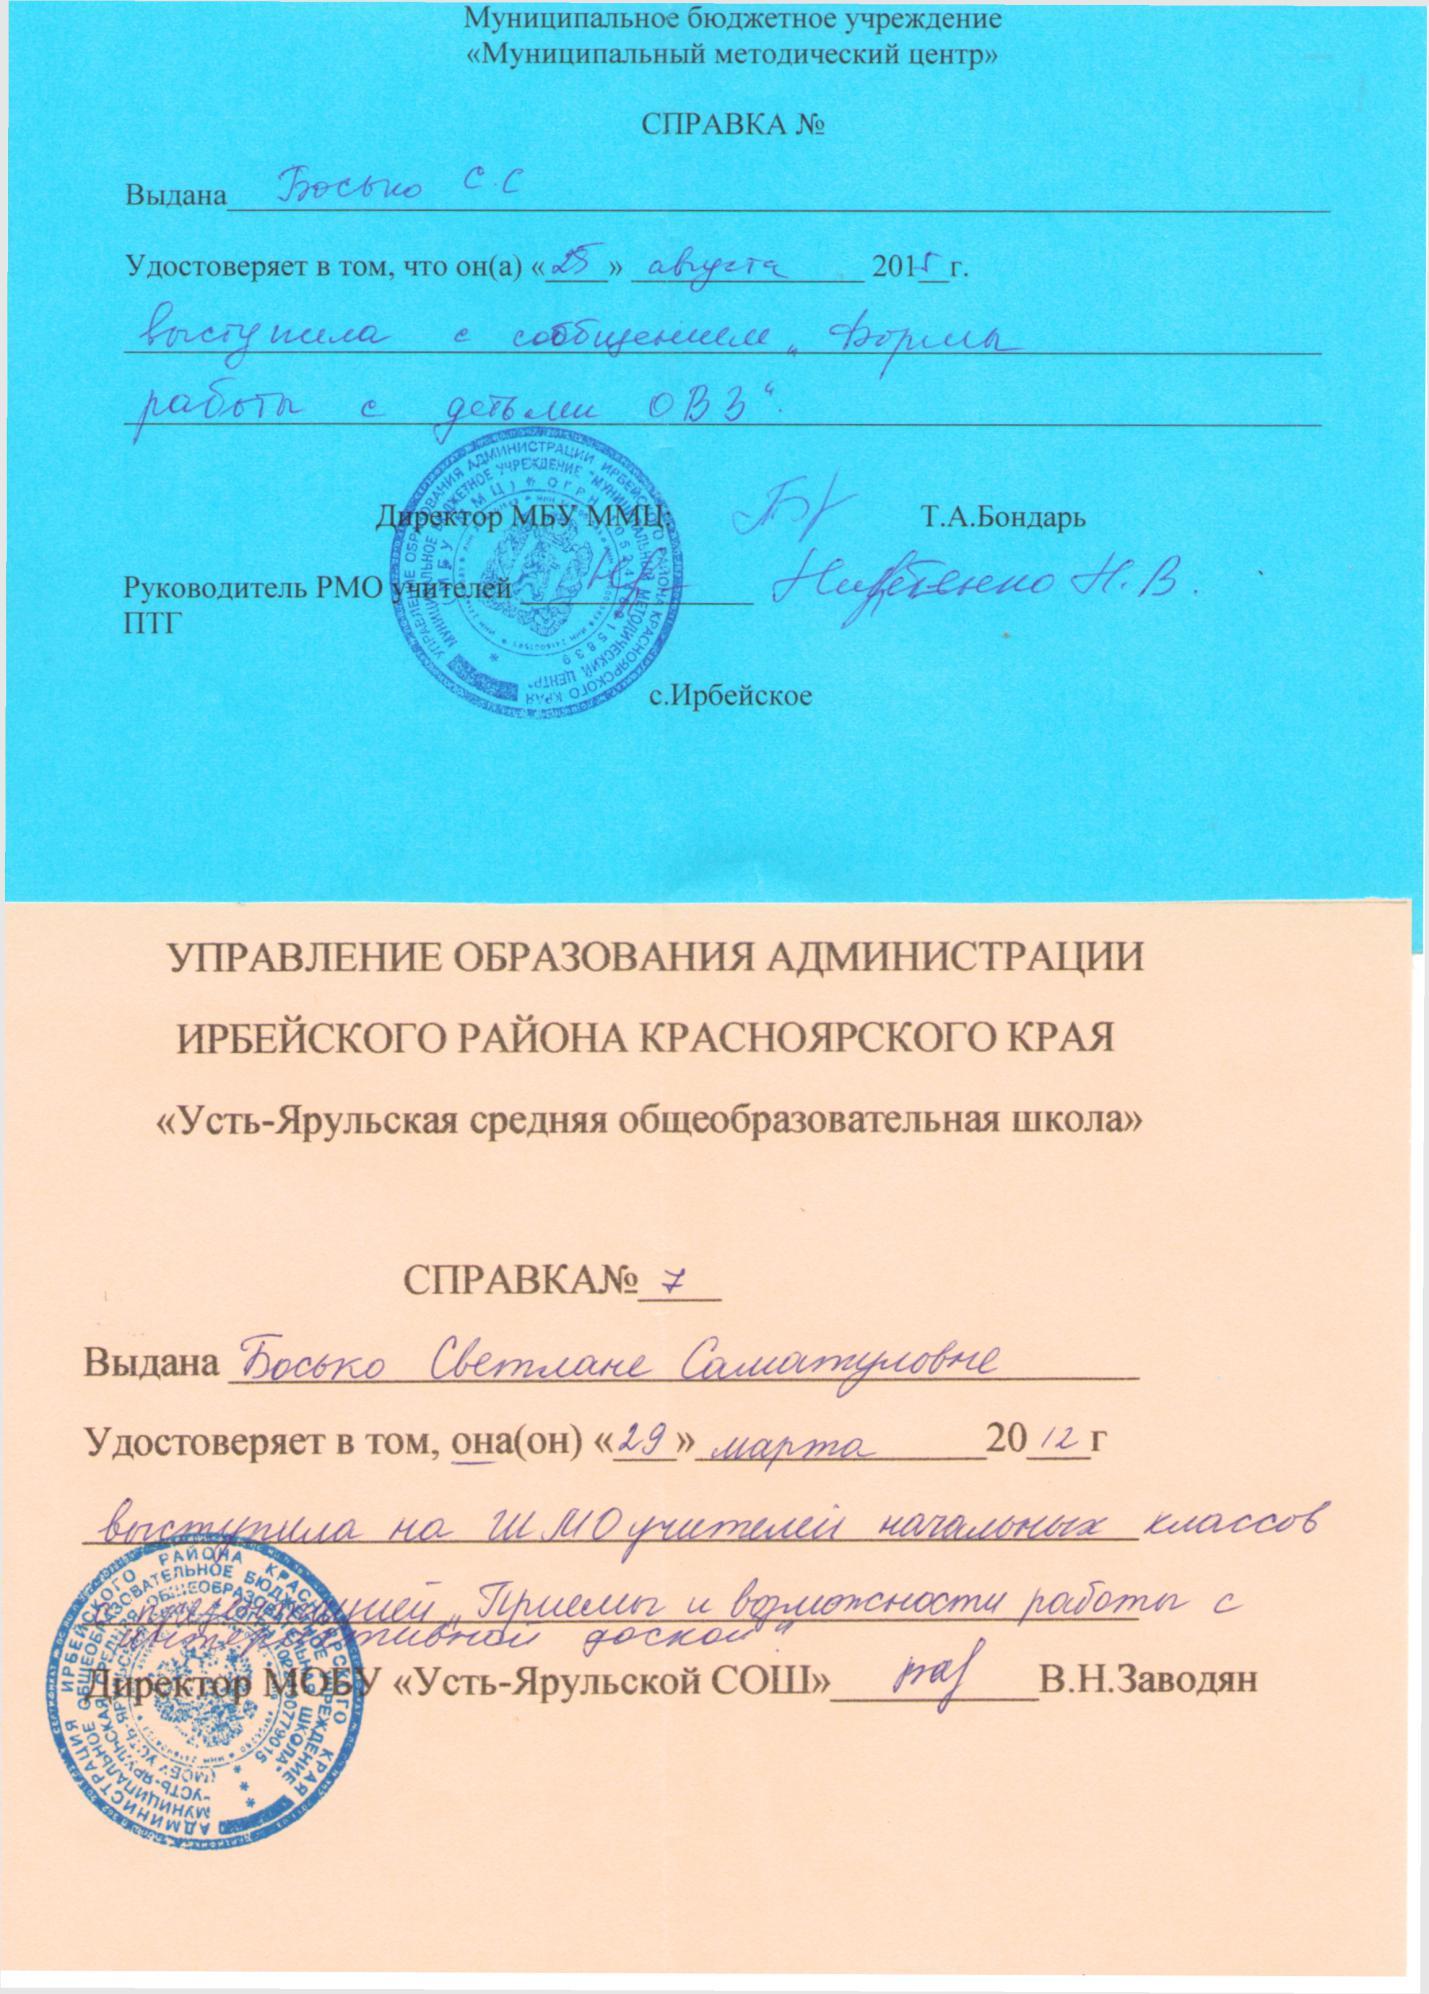 C:\Documents and Settings\Светлана Саматуловна\Рабочий стол\квалификация\выступл на мо.tif